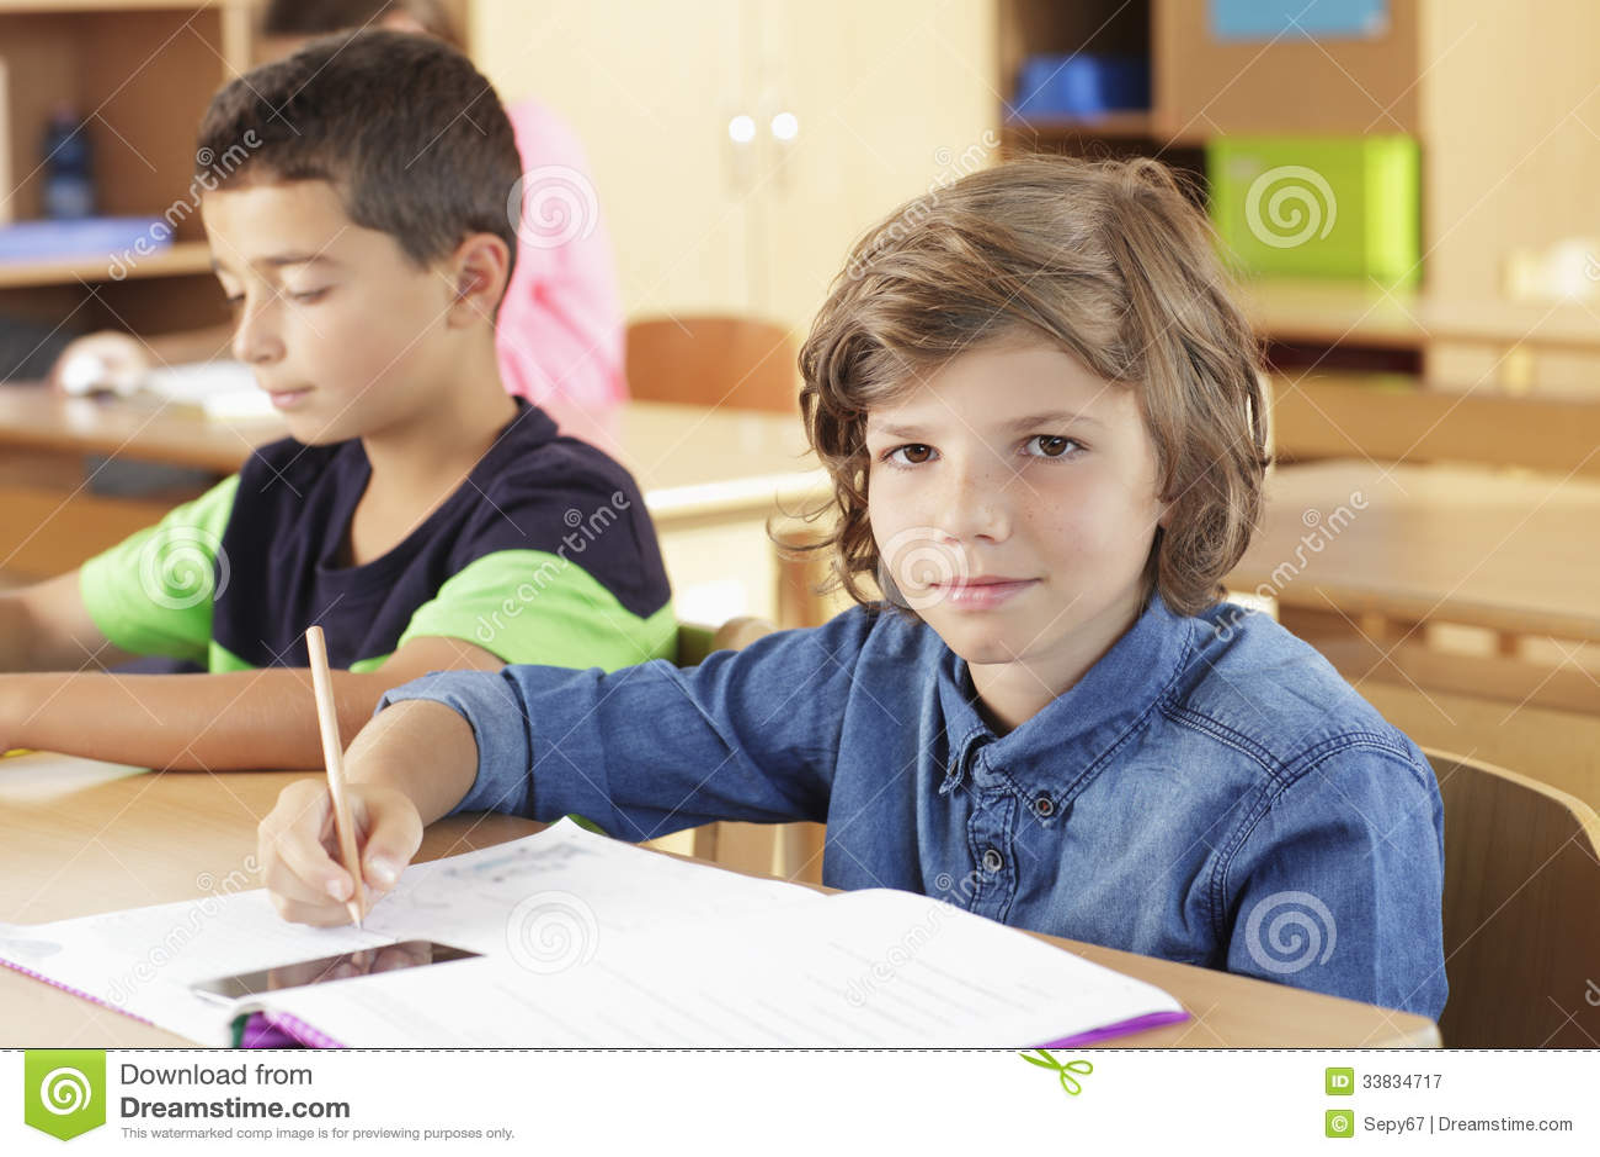 Elementary Classrooms Writing ~ Elementary school classroom royalty free stock photography